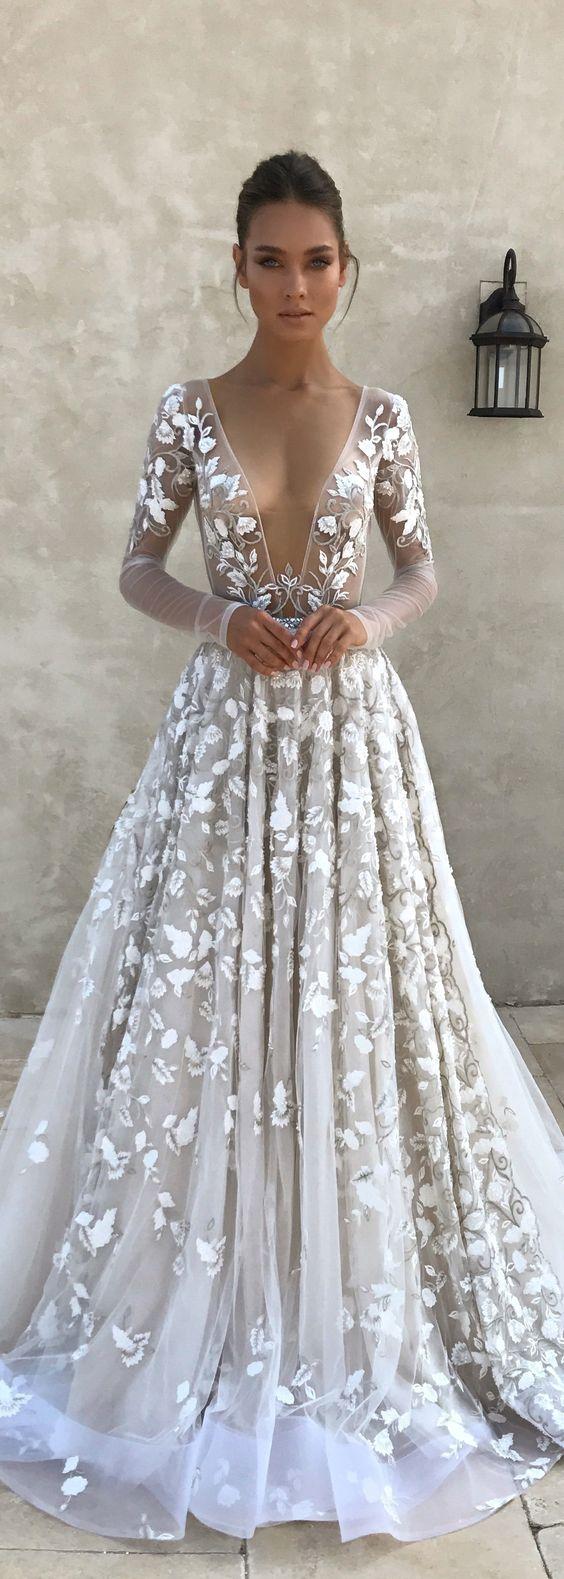 Stunning Luxury Sexy Tulle Wedding Dresses Sexy Deep V Neck Sheer